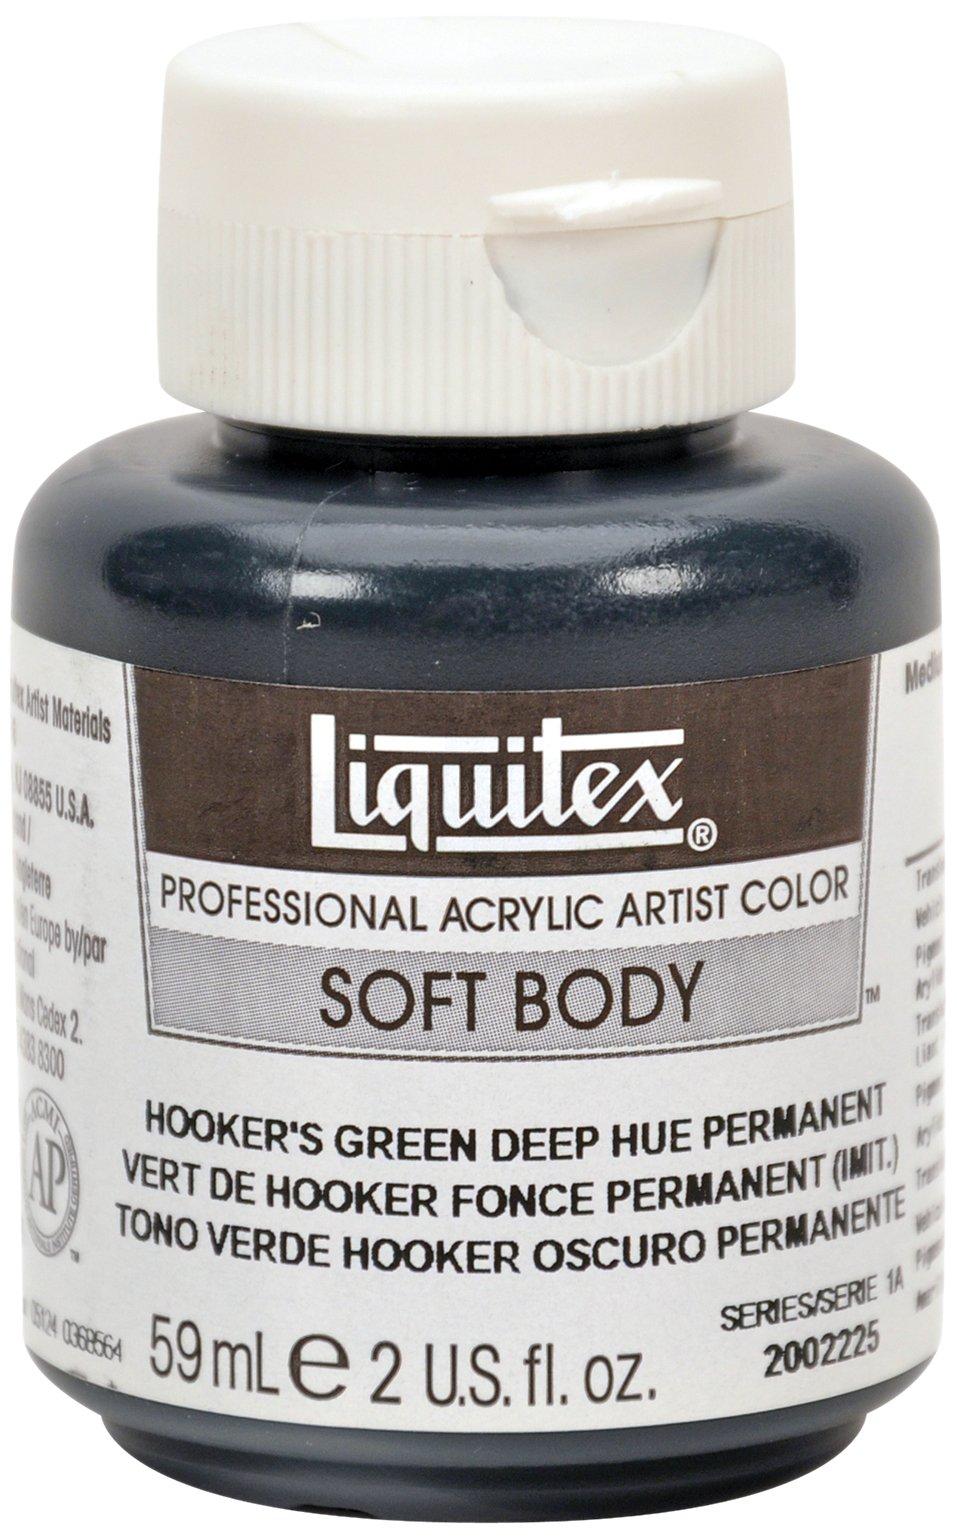 Liquitex 2002225 Professional Soft Body Acrylic Paint 2-oz jar, Hooker's Green Deep Hue Permanent